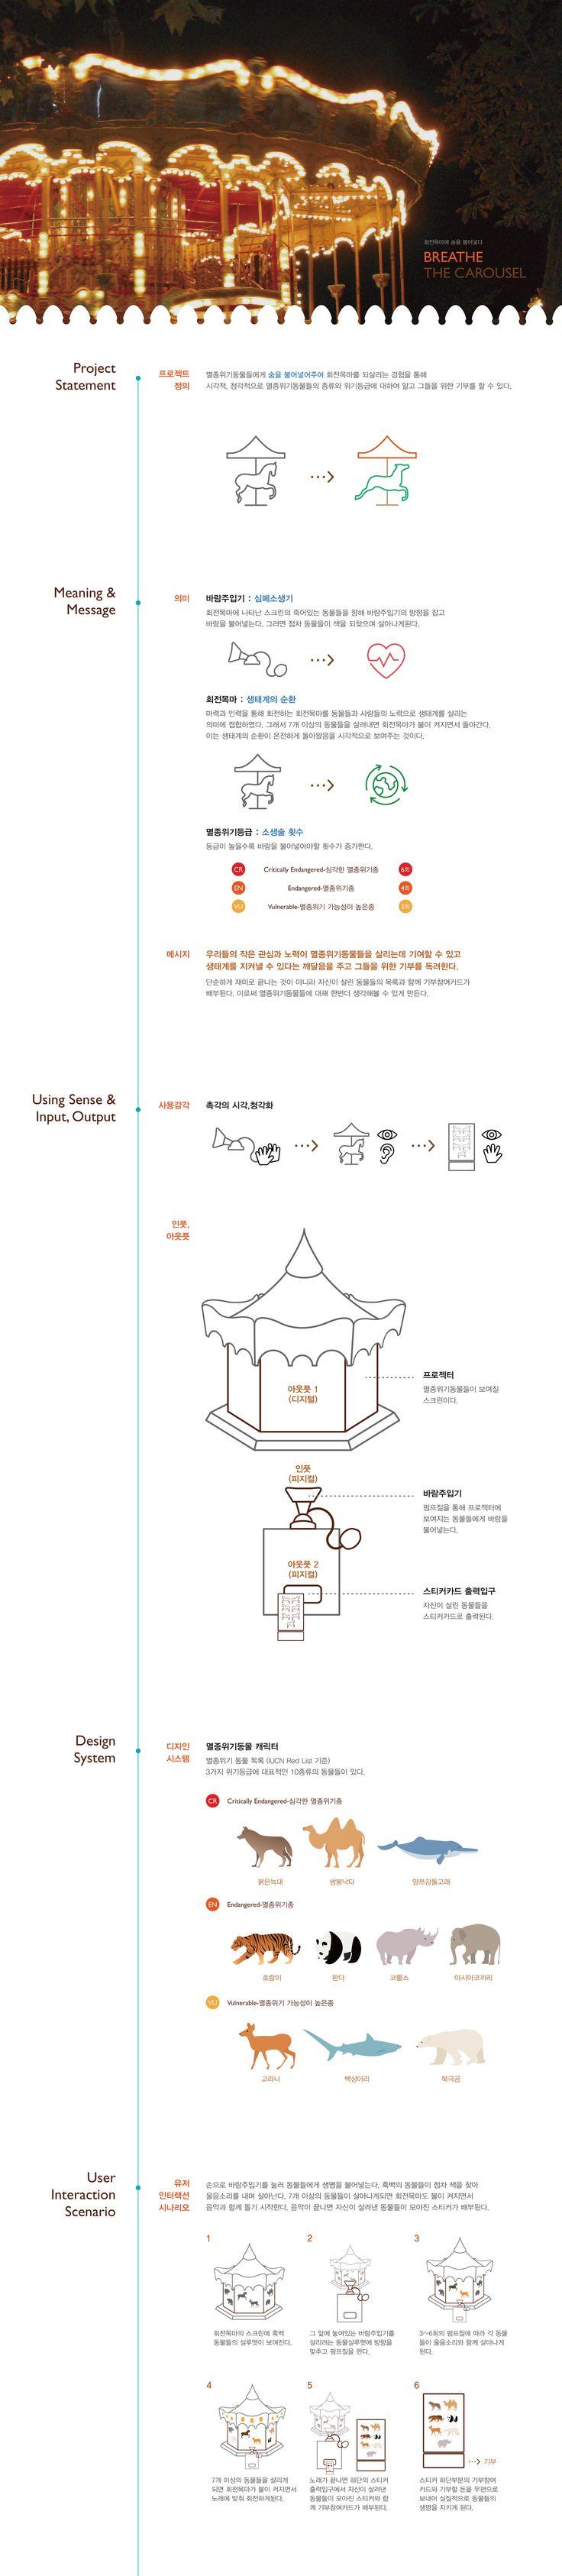 Lee Ji Yeon   Breathe the Carousel   Information Visualization 2016│ Major in Digital Media Design │#hicoda │hicoda.hongik.ac.kr